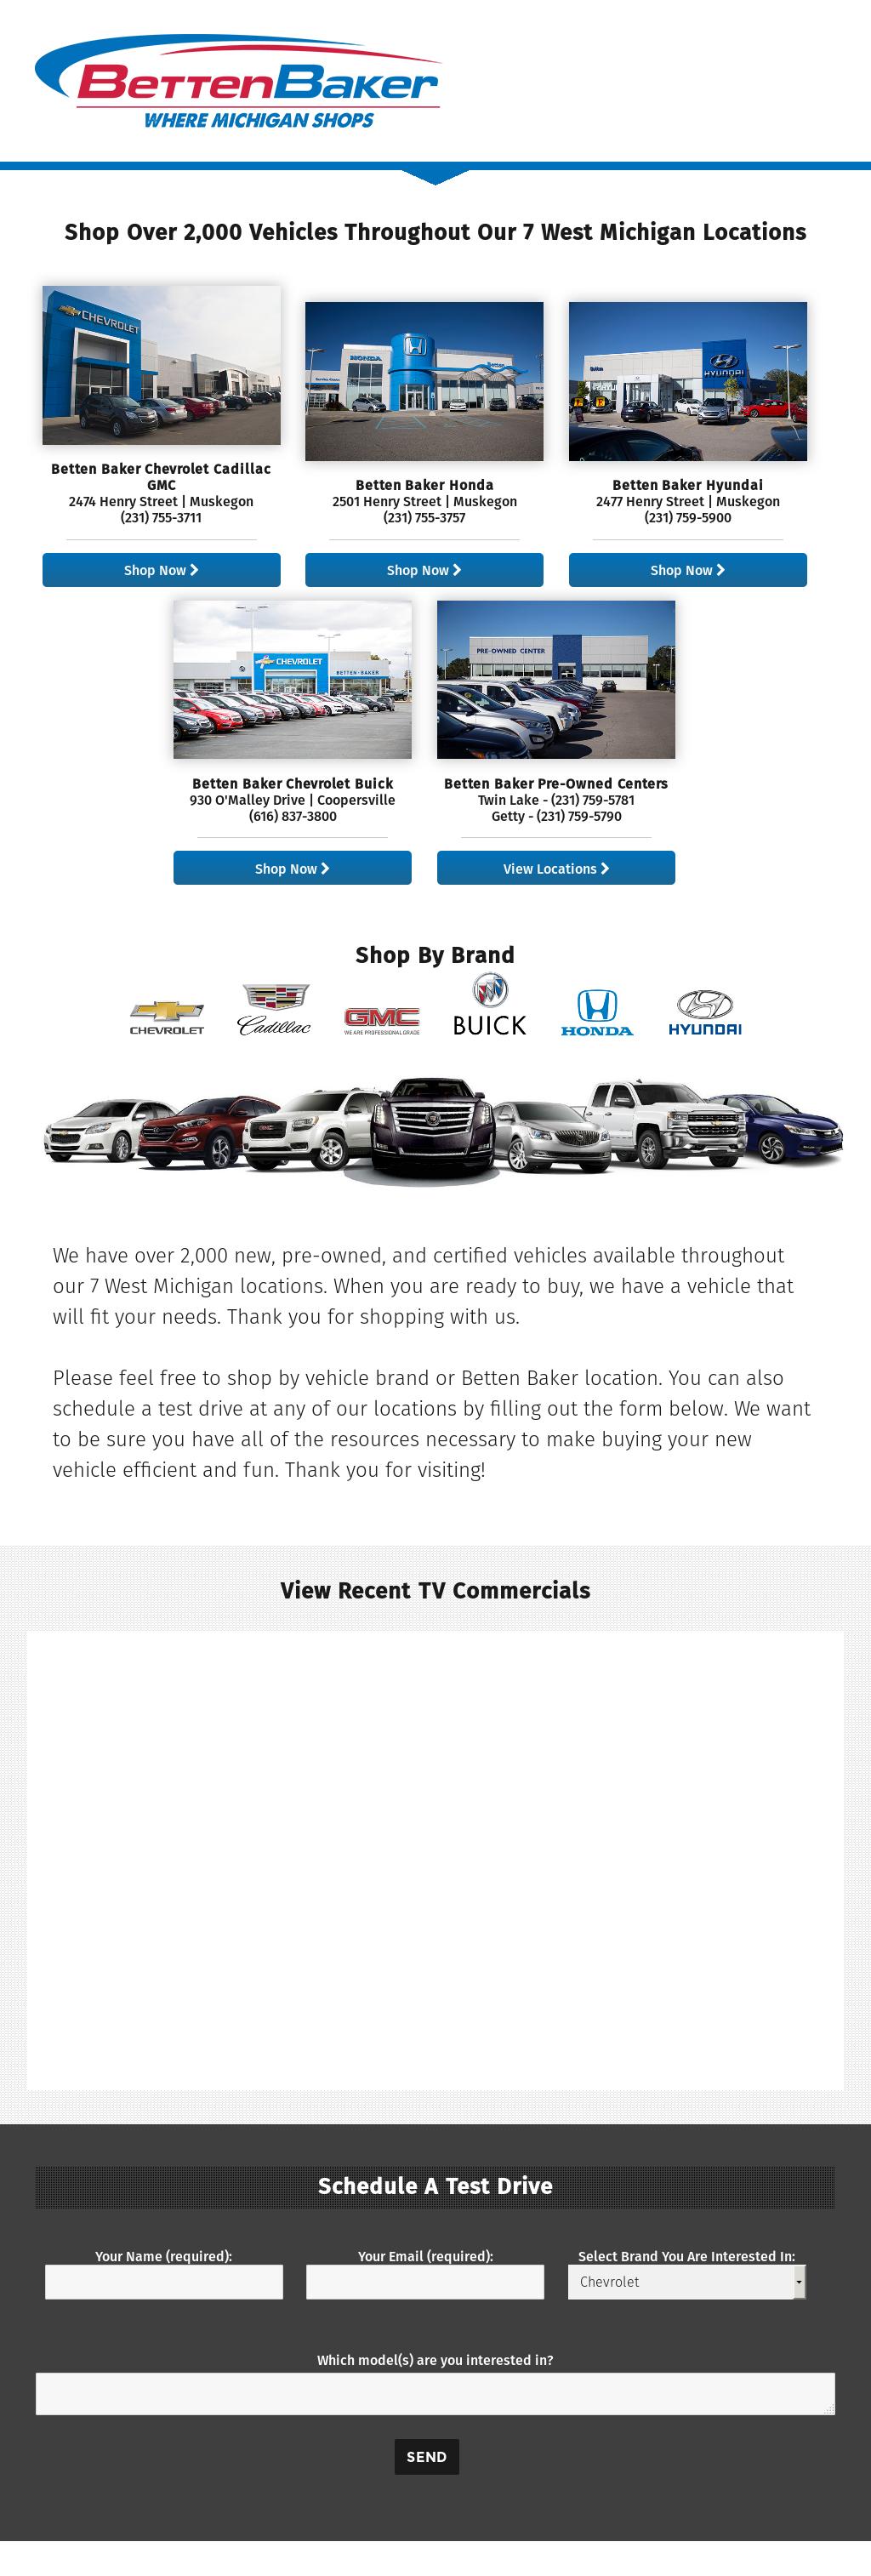 Betten Baker Chevrolet Buick Competitors Revenue And